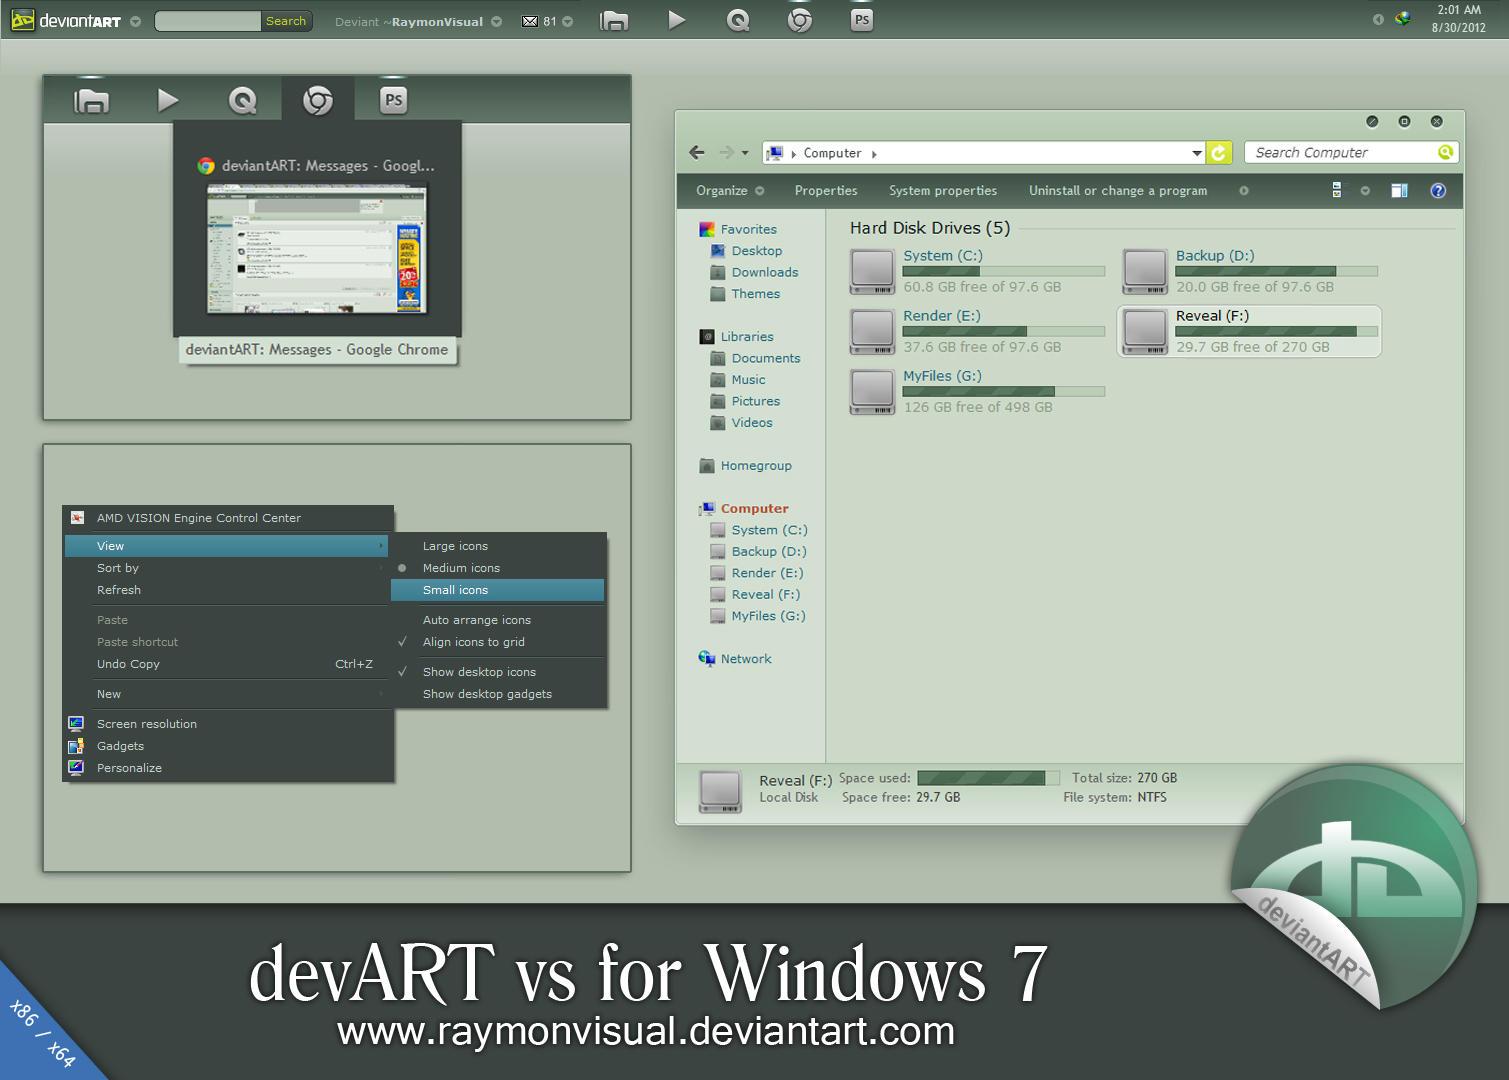 devART vs by RaymonVisual